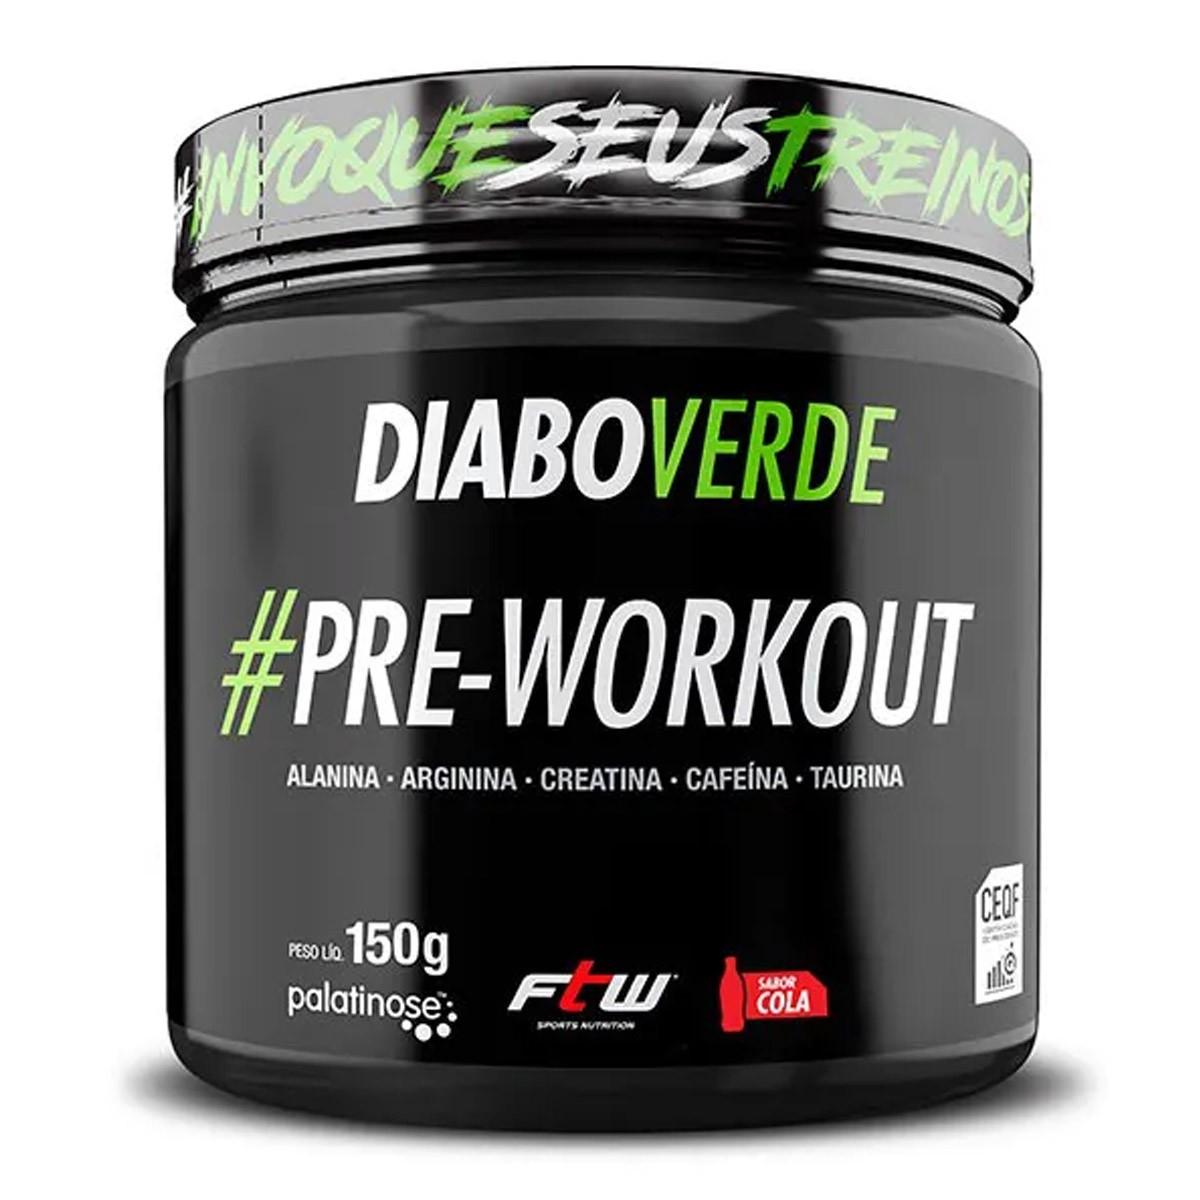 Diabo Verde #Pre-Workout 150g - FTW